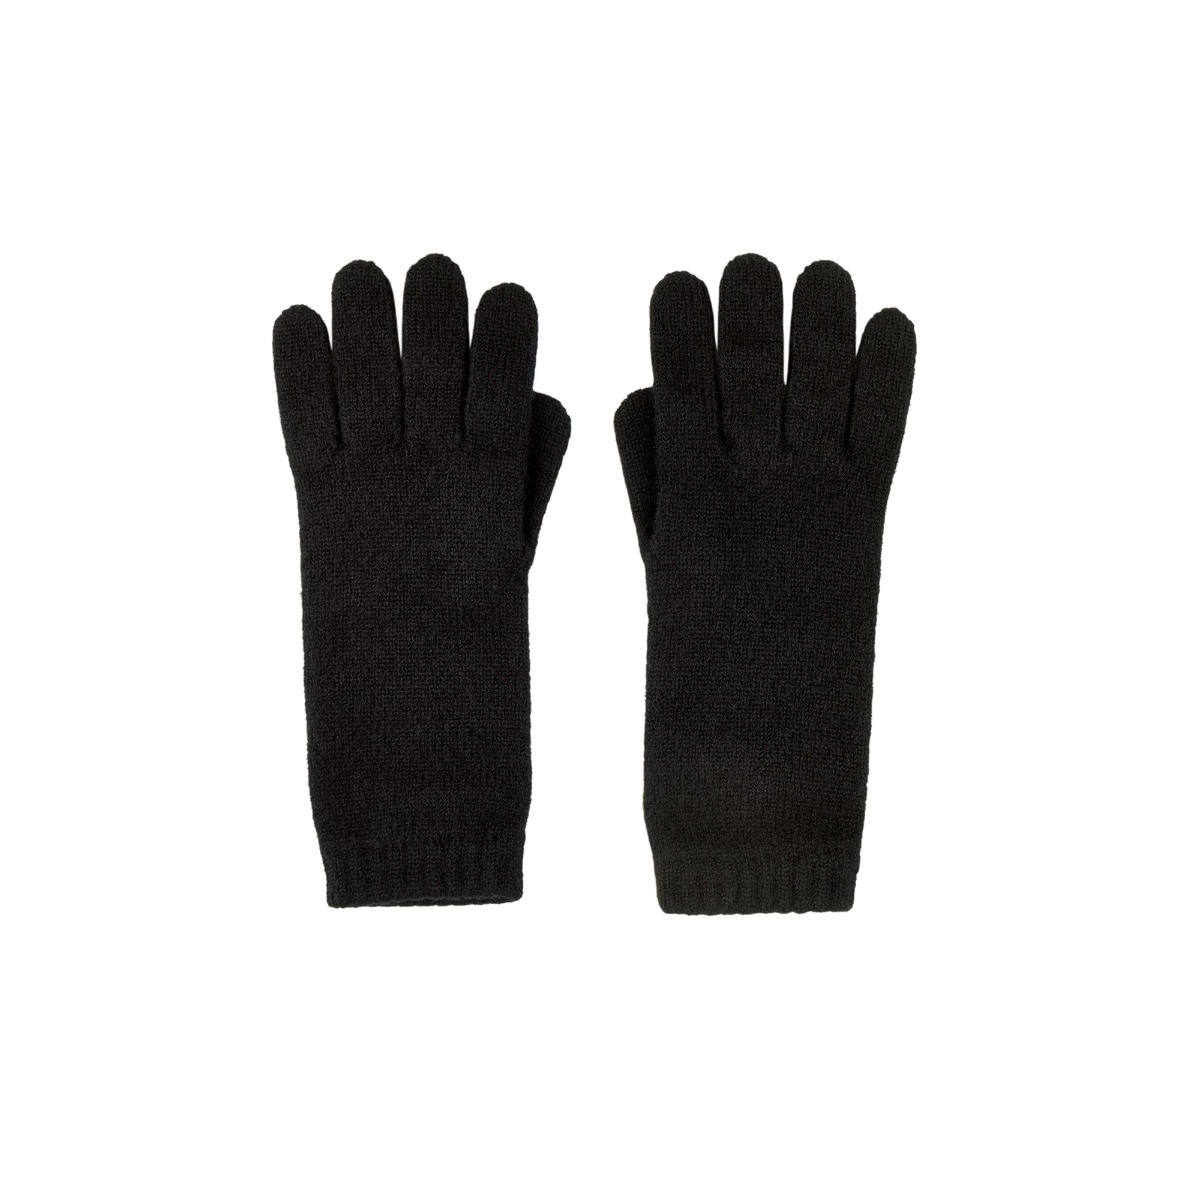 Black cashmere womens gloves